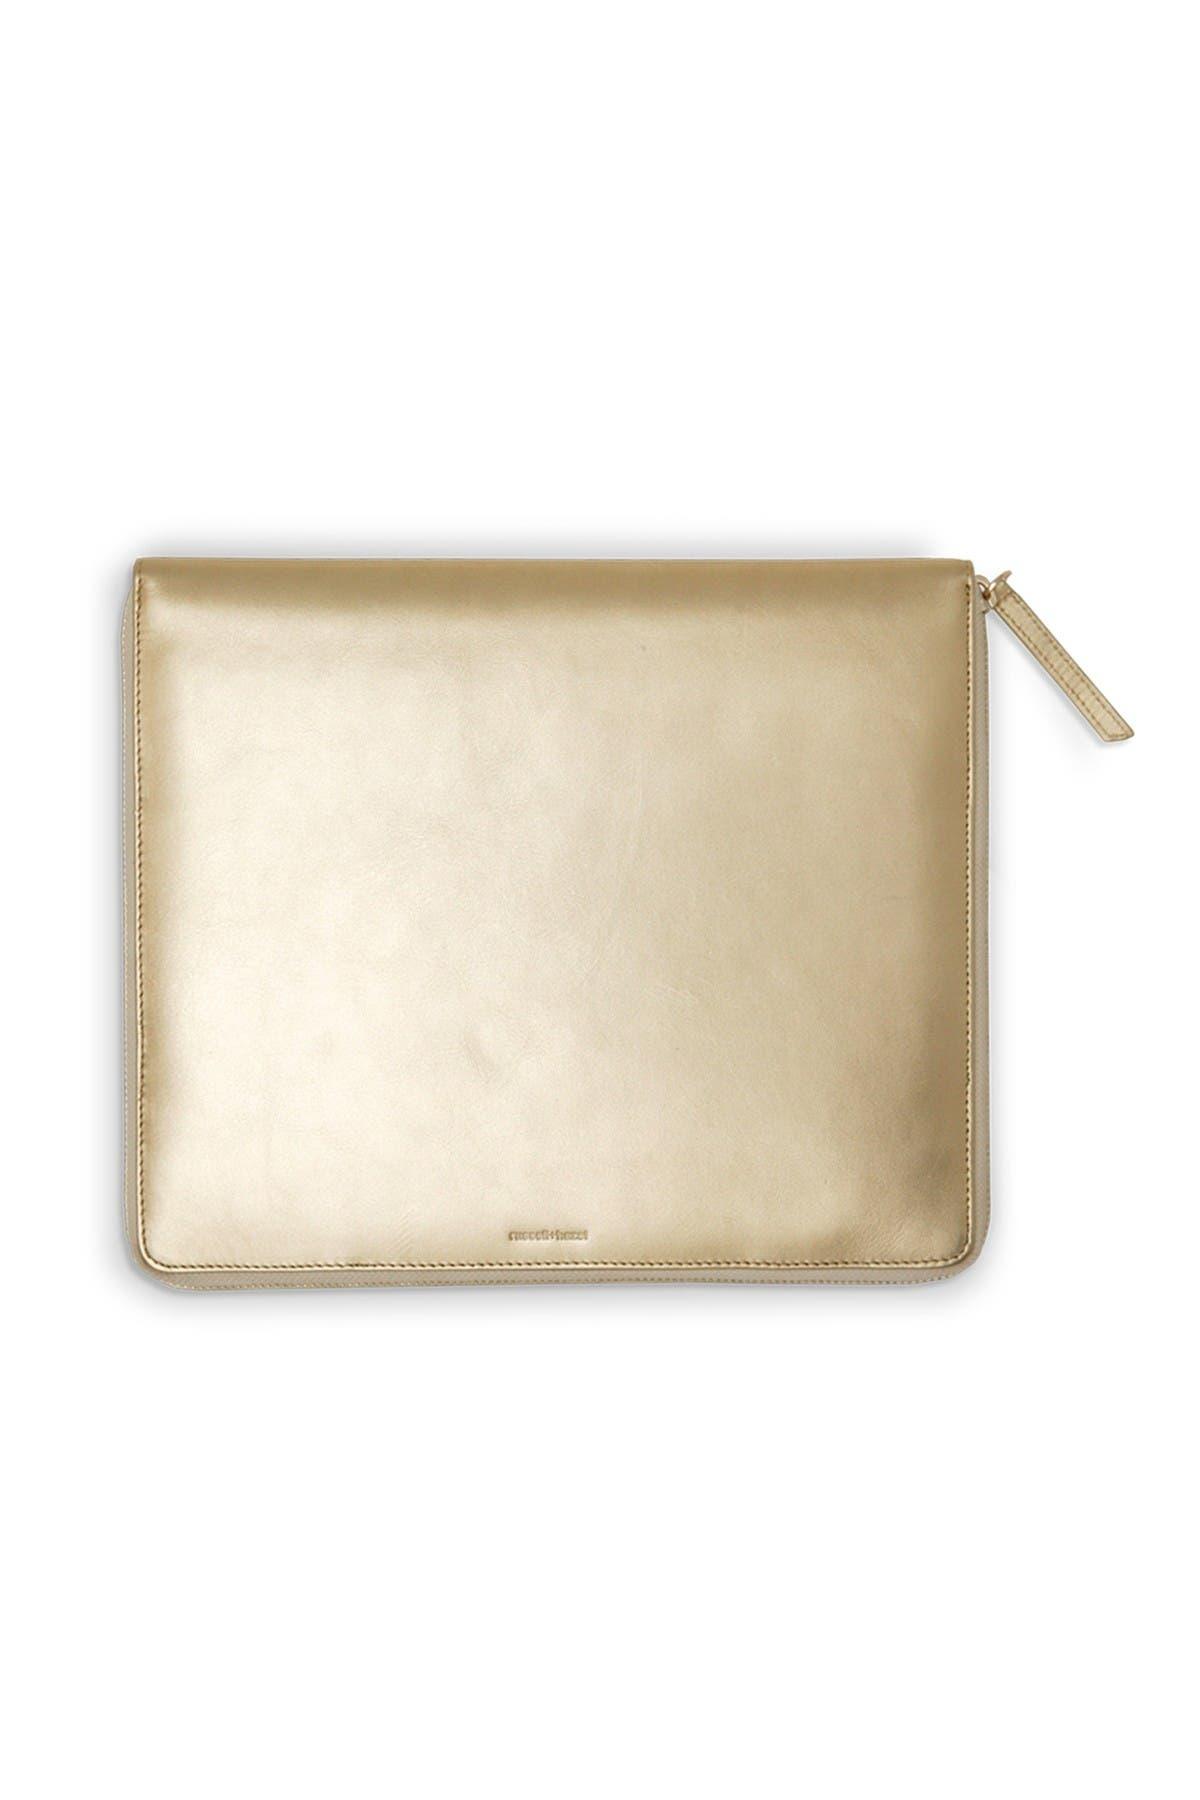 Image of GARTNER STUDIOS RH Tablet Folio - Gold